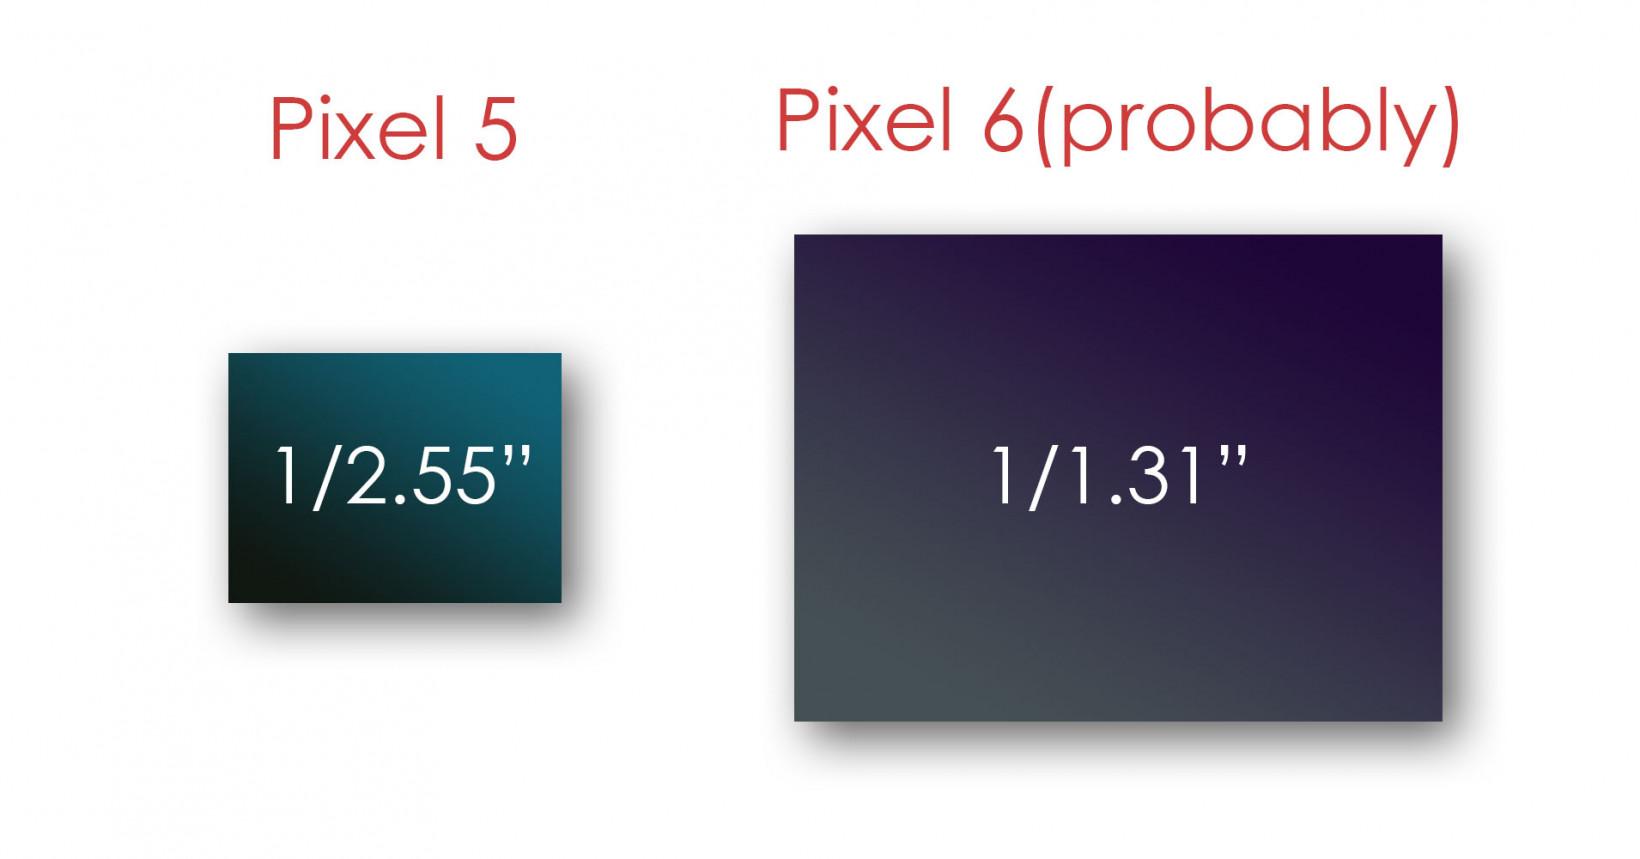 Pixel 5 vs Pixel 6's likely sensor size